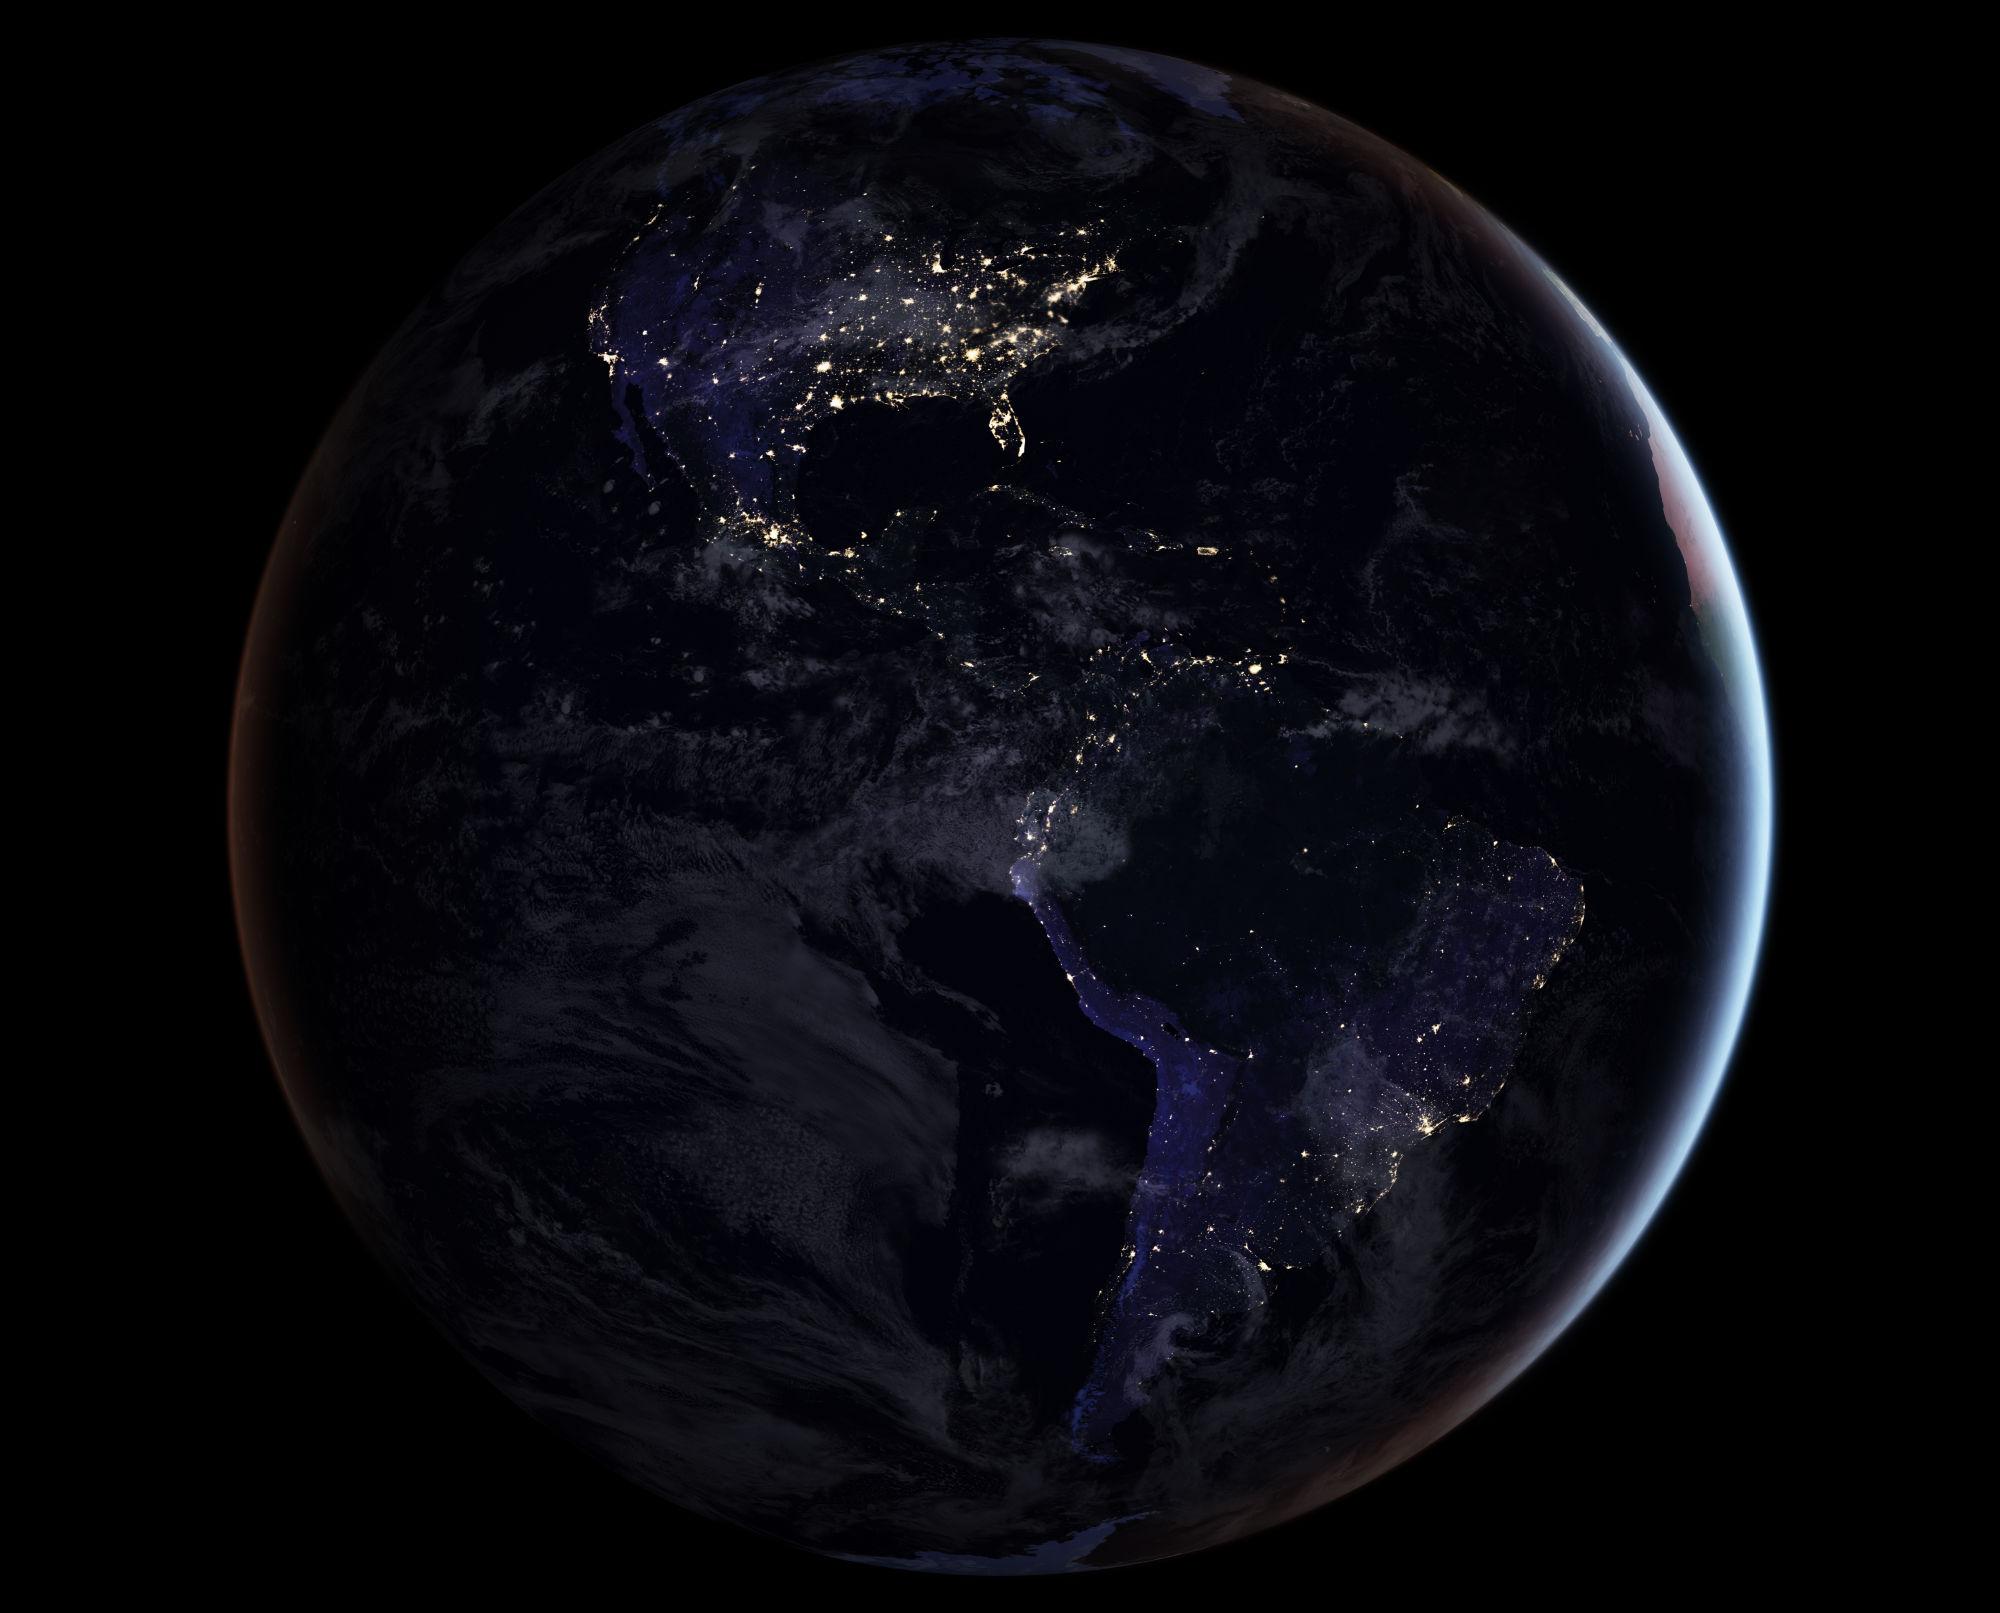 blackmarble 2016 americas composite image